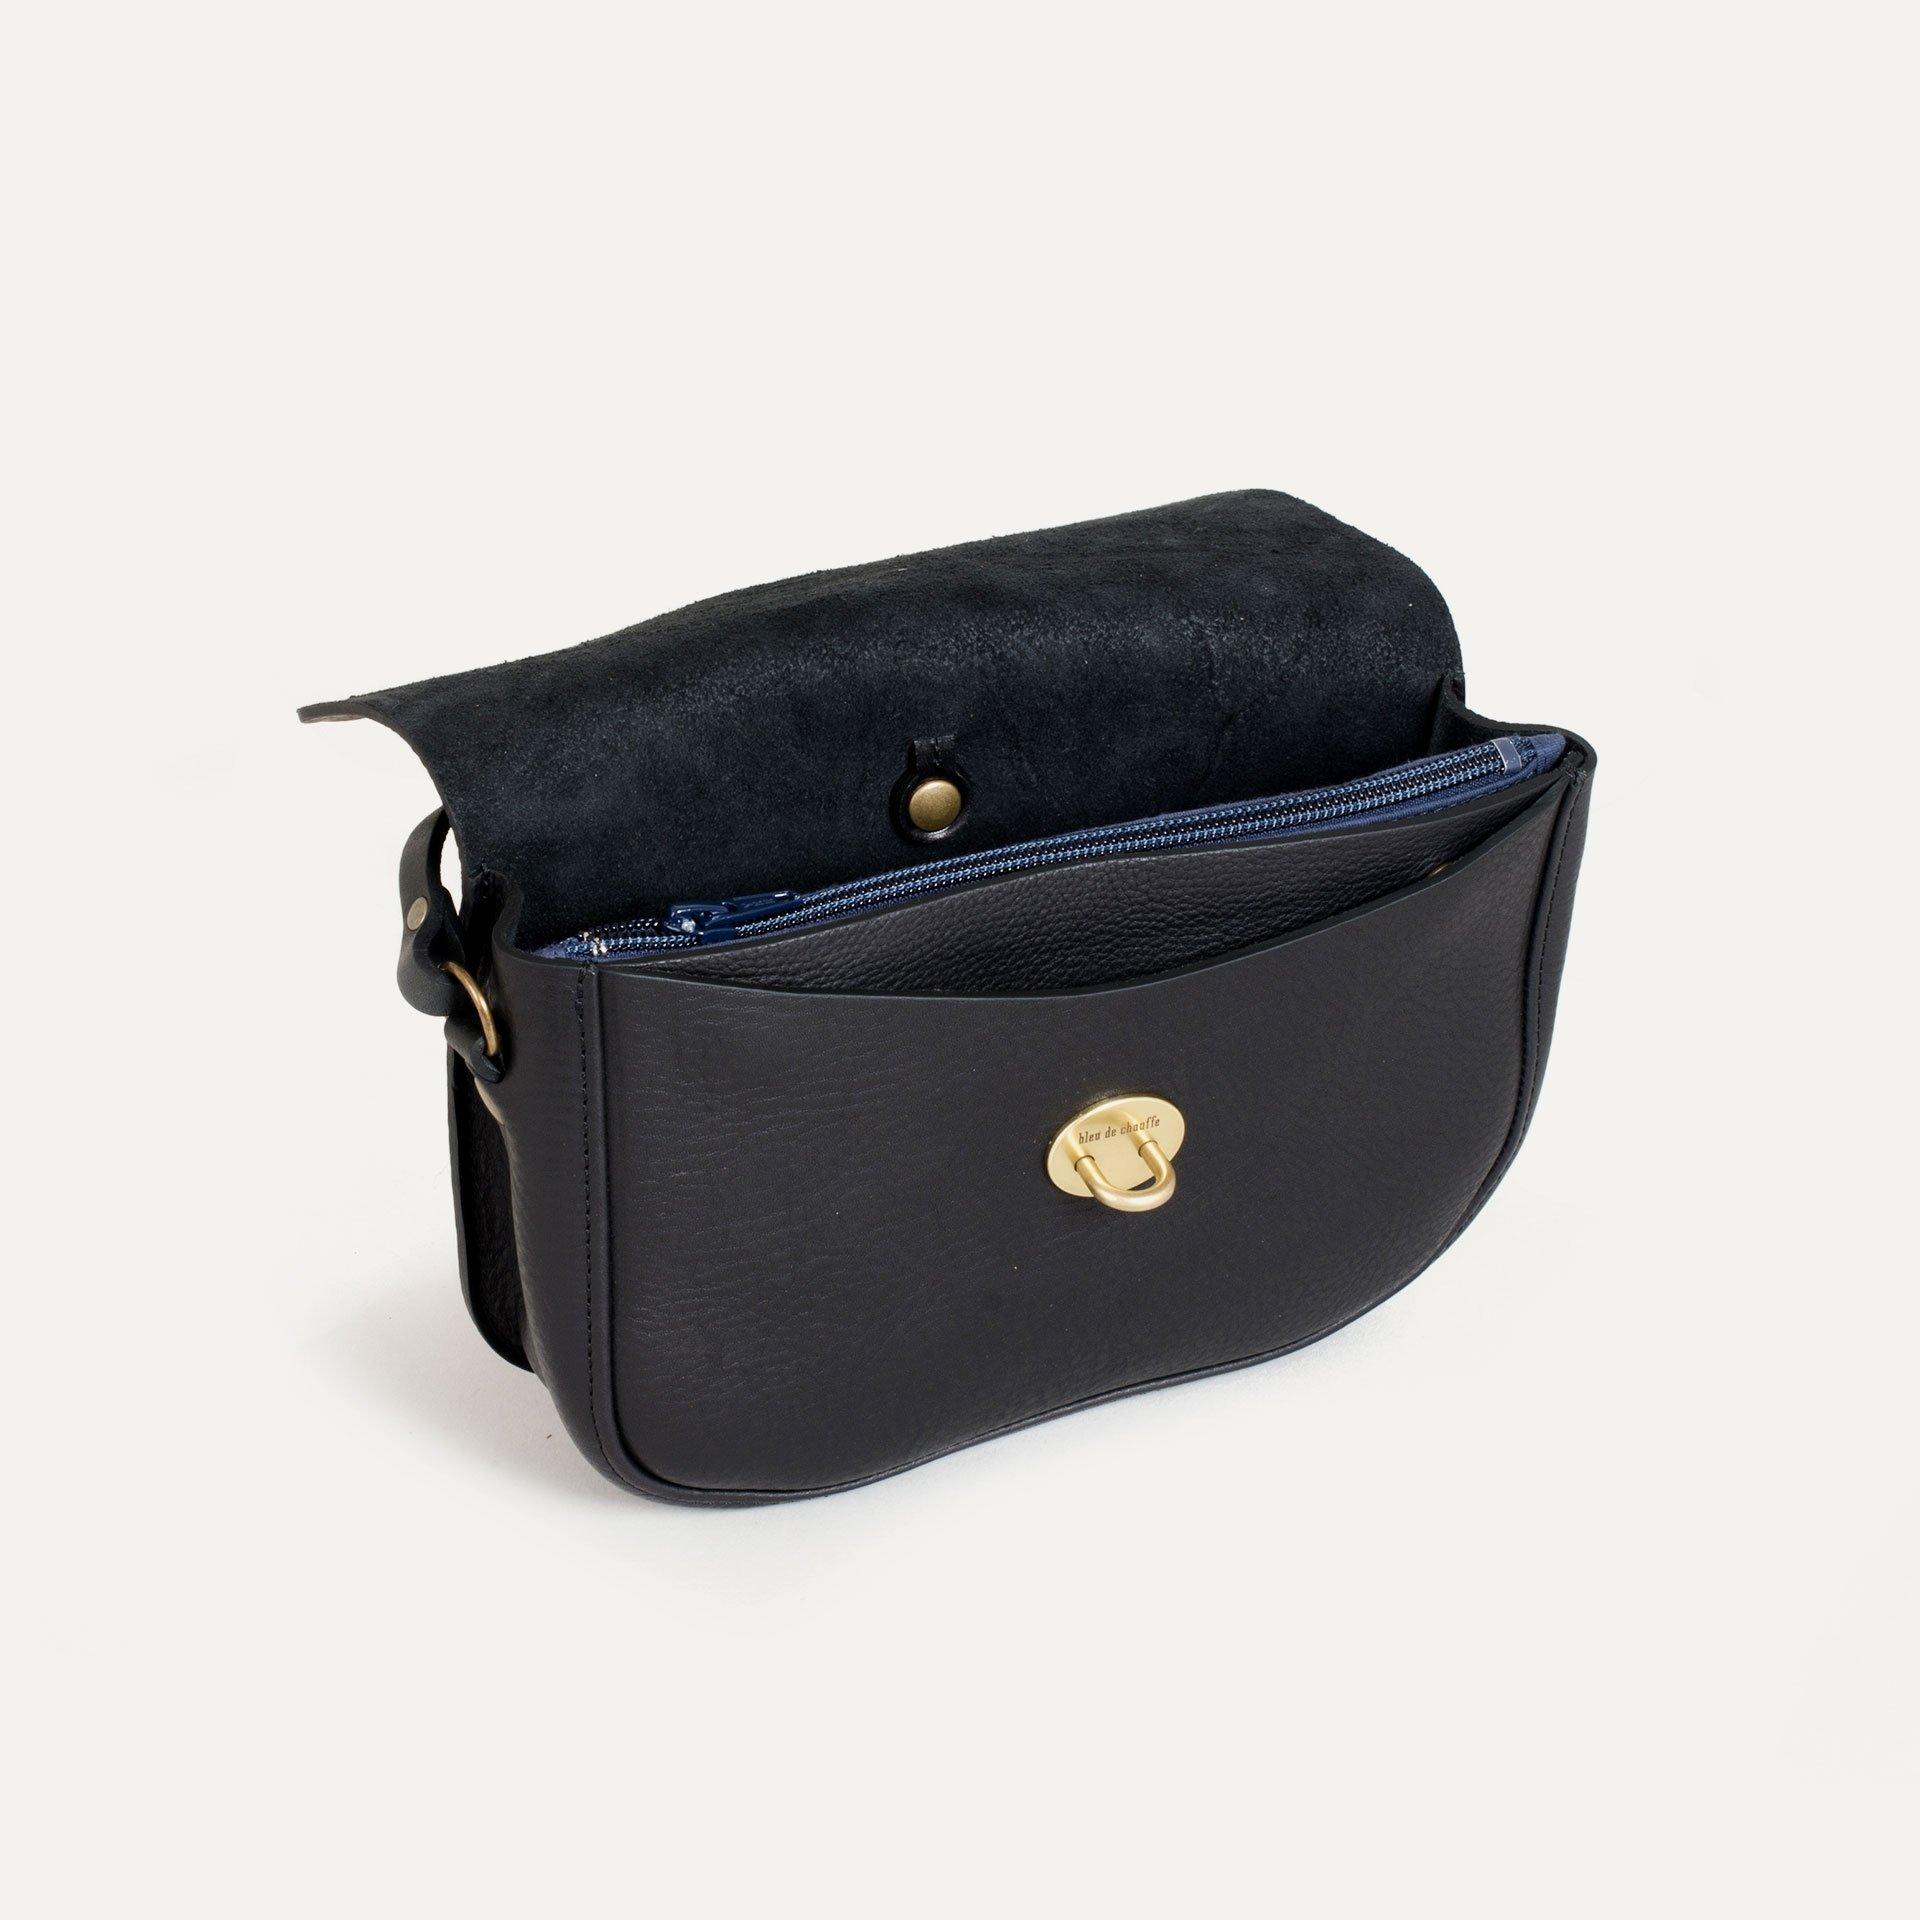 Pastis handbag - Black (image n°3)